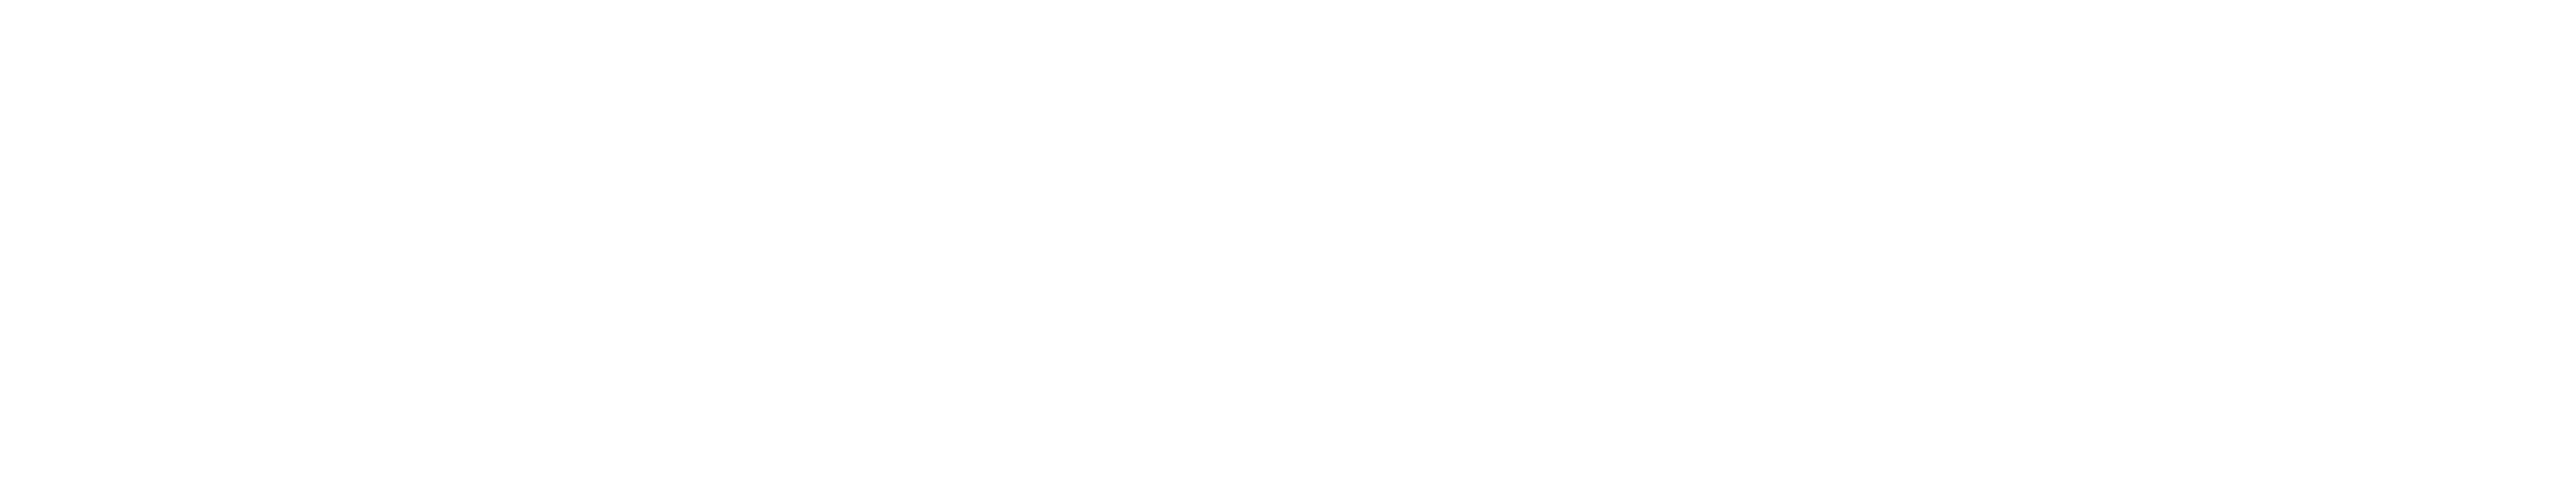 behance-logo-2hm